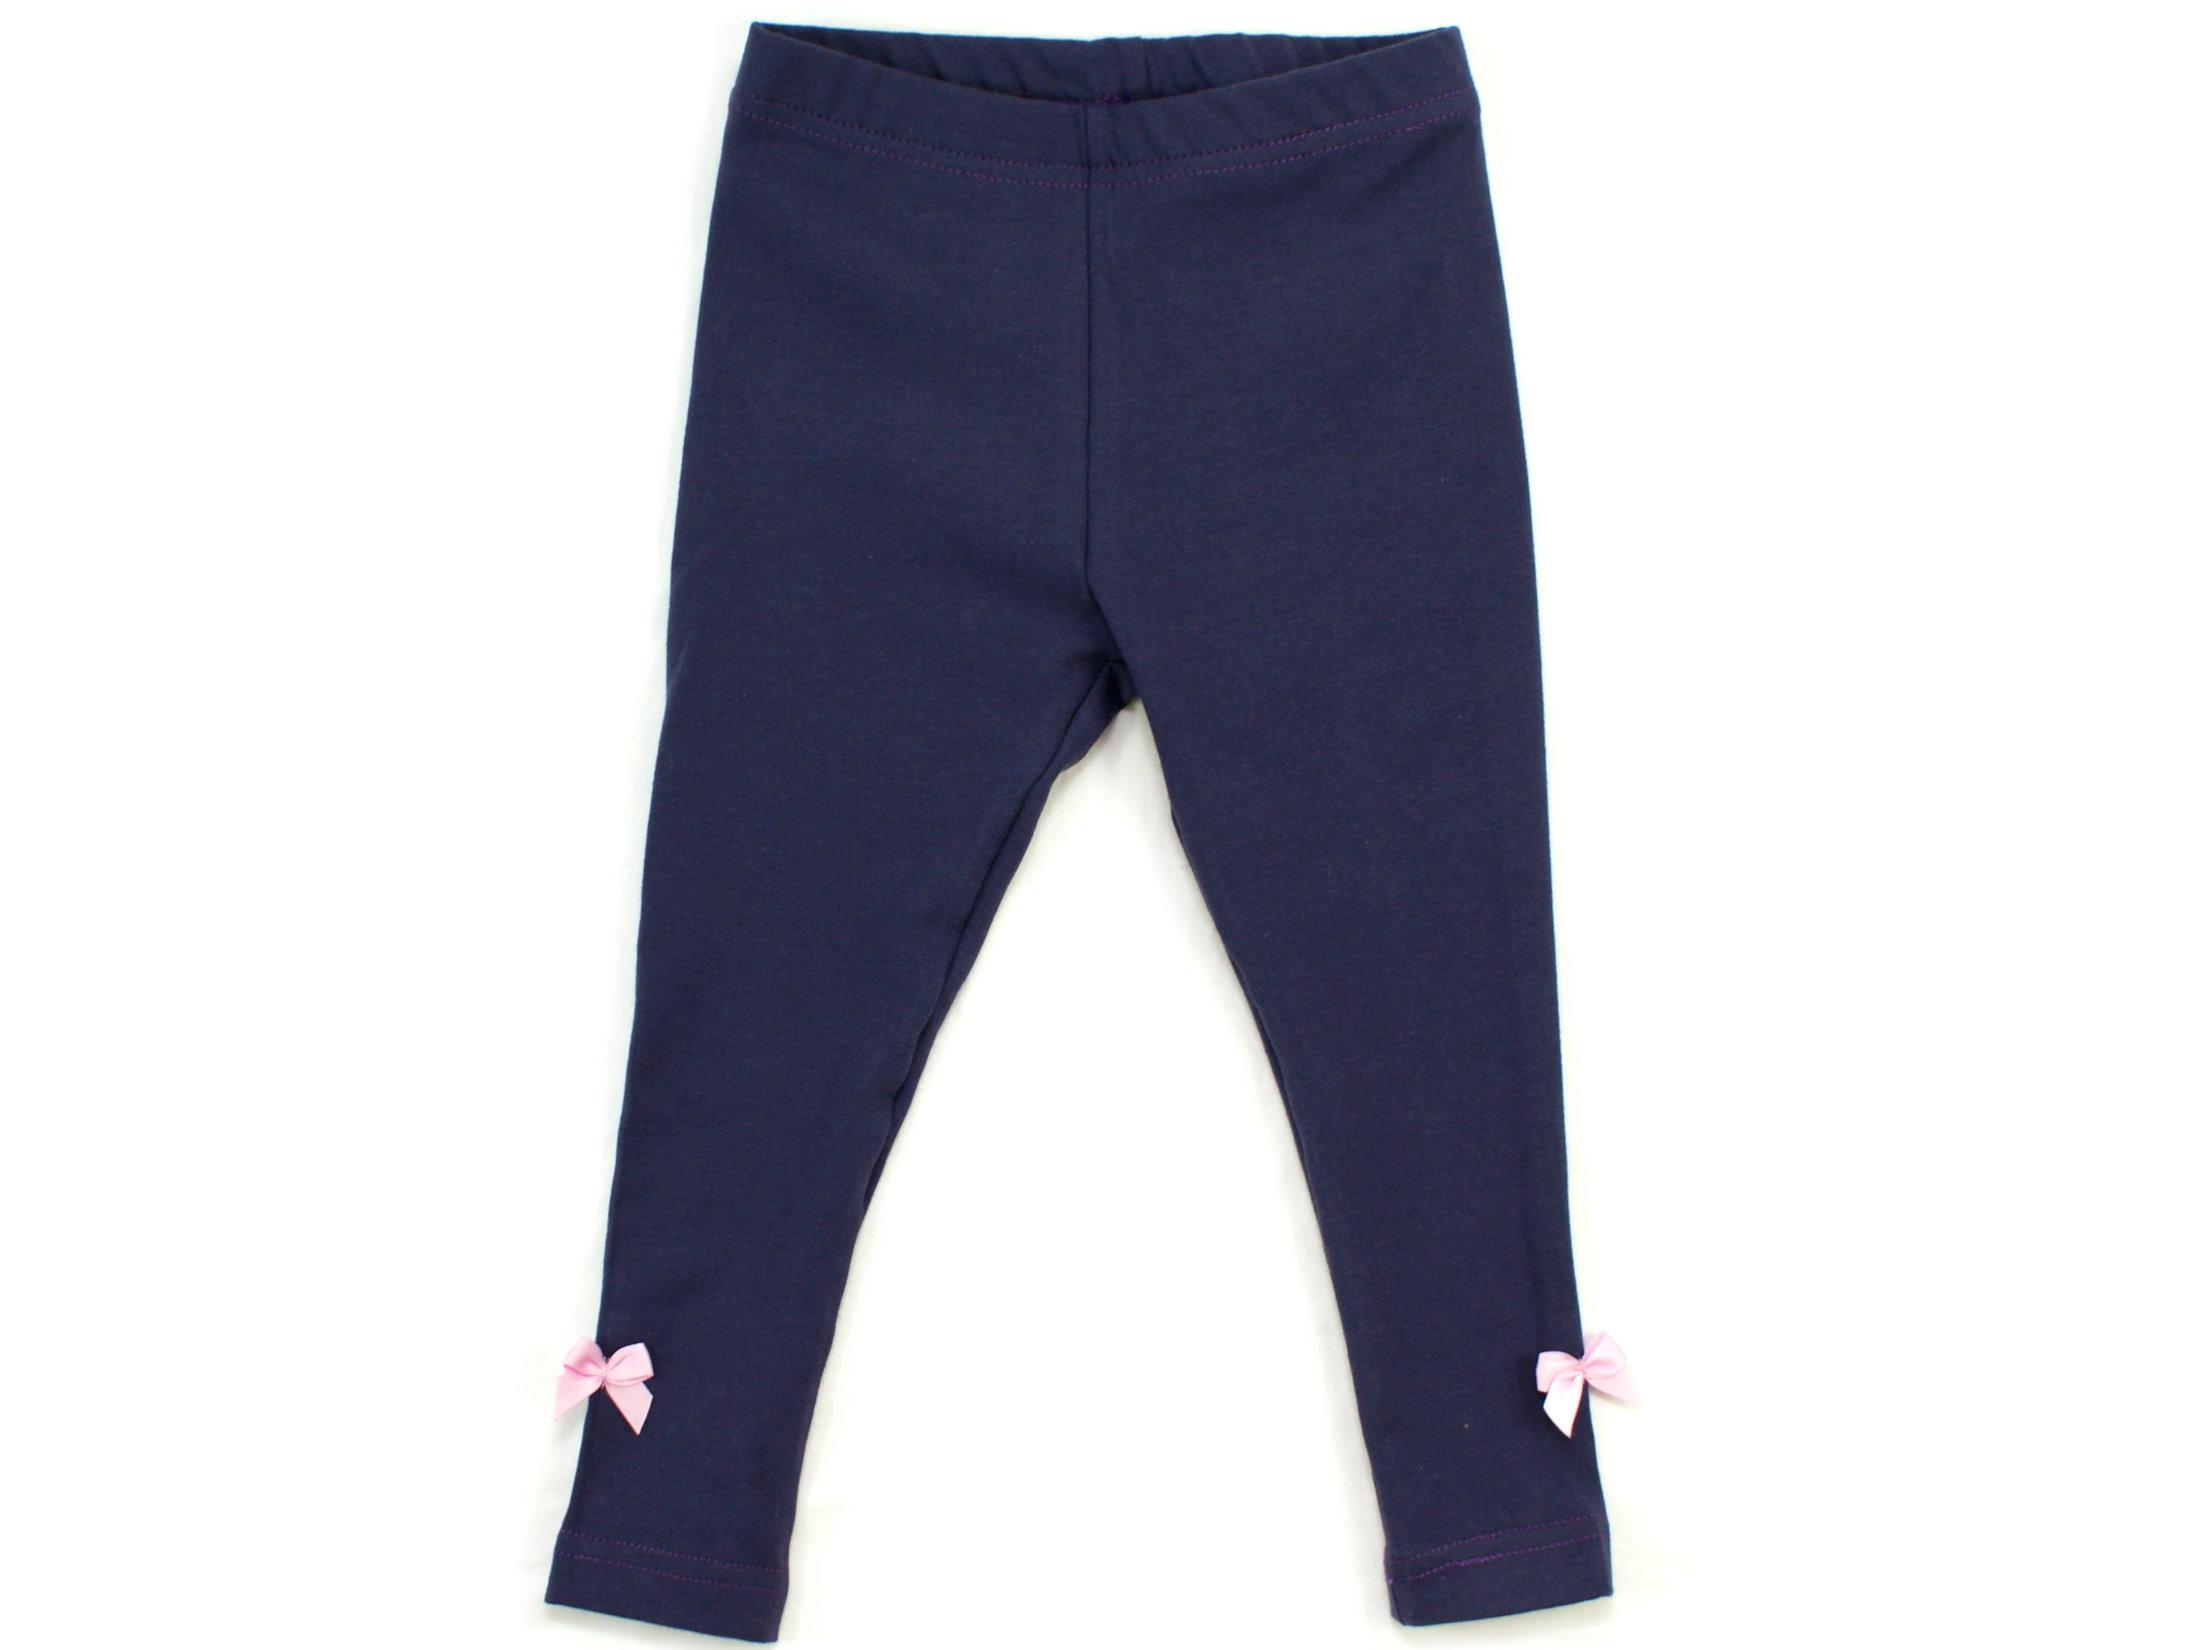 Kinder Leggings uni violett